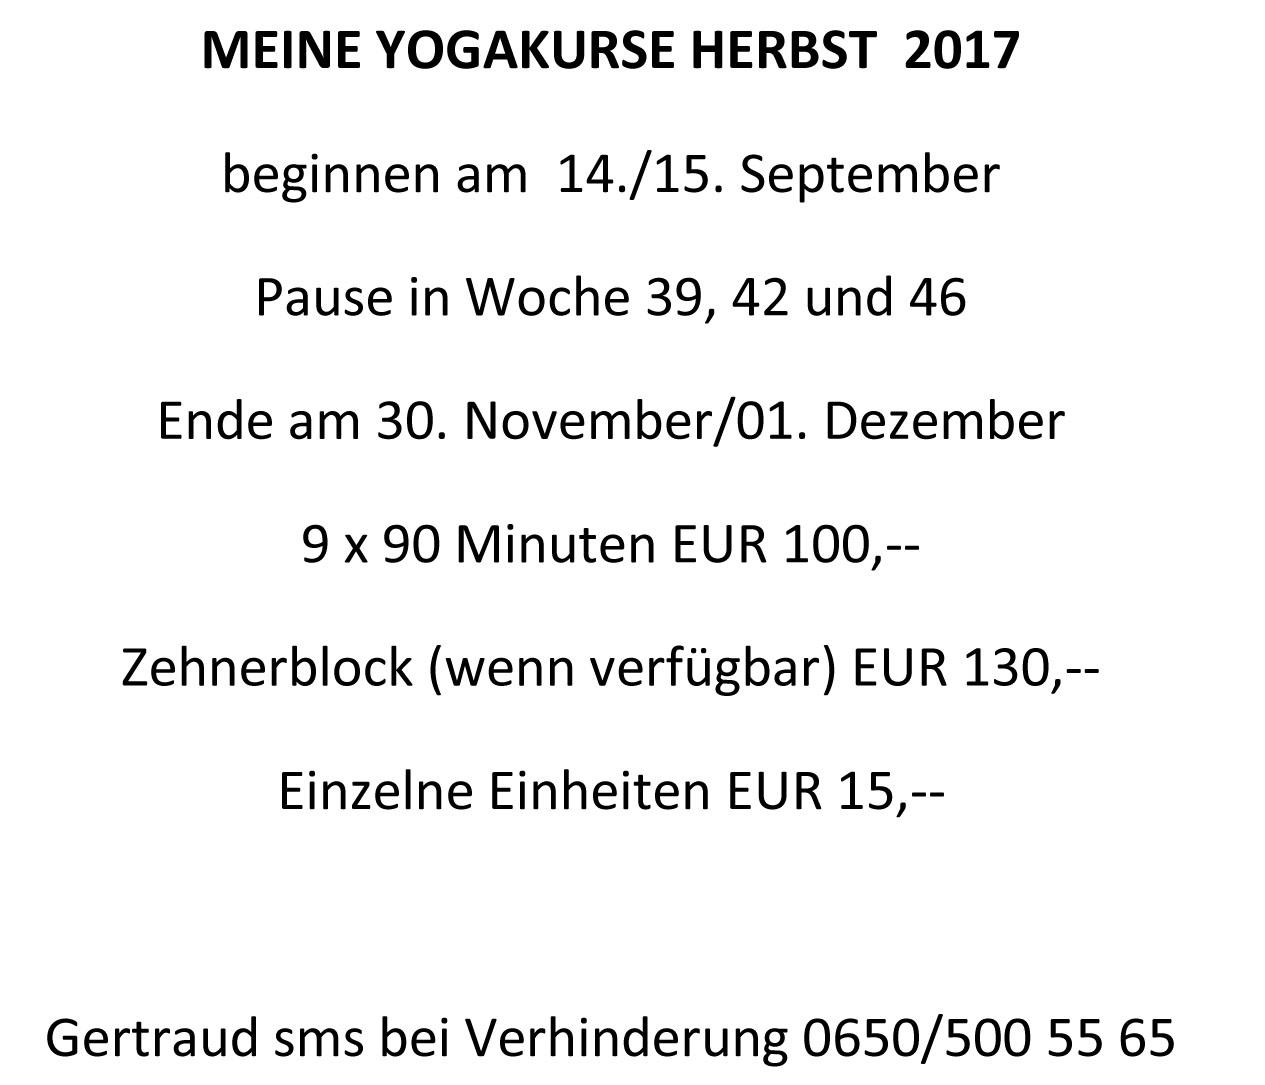 Vorschau Yoga Kurse Kuchl Herbst 2017 Kopie